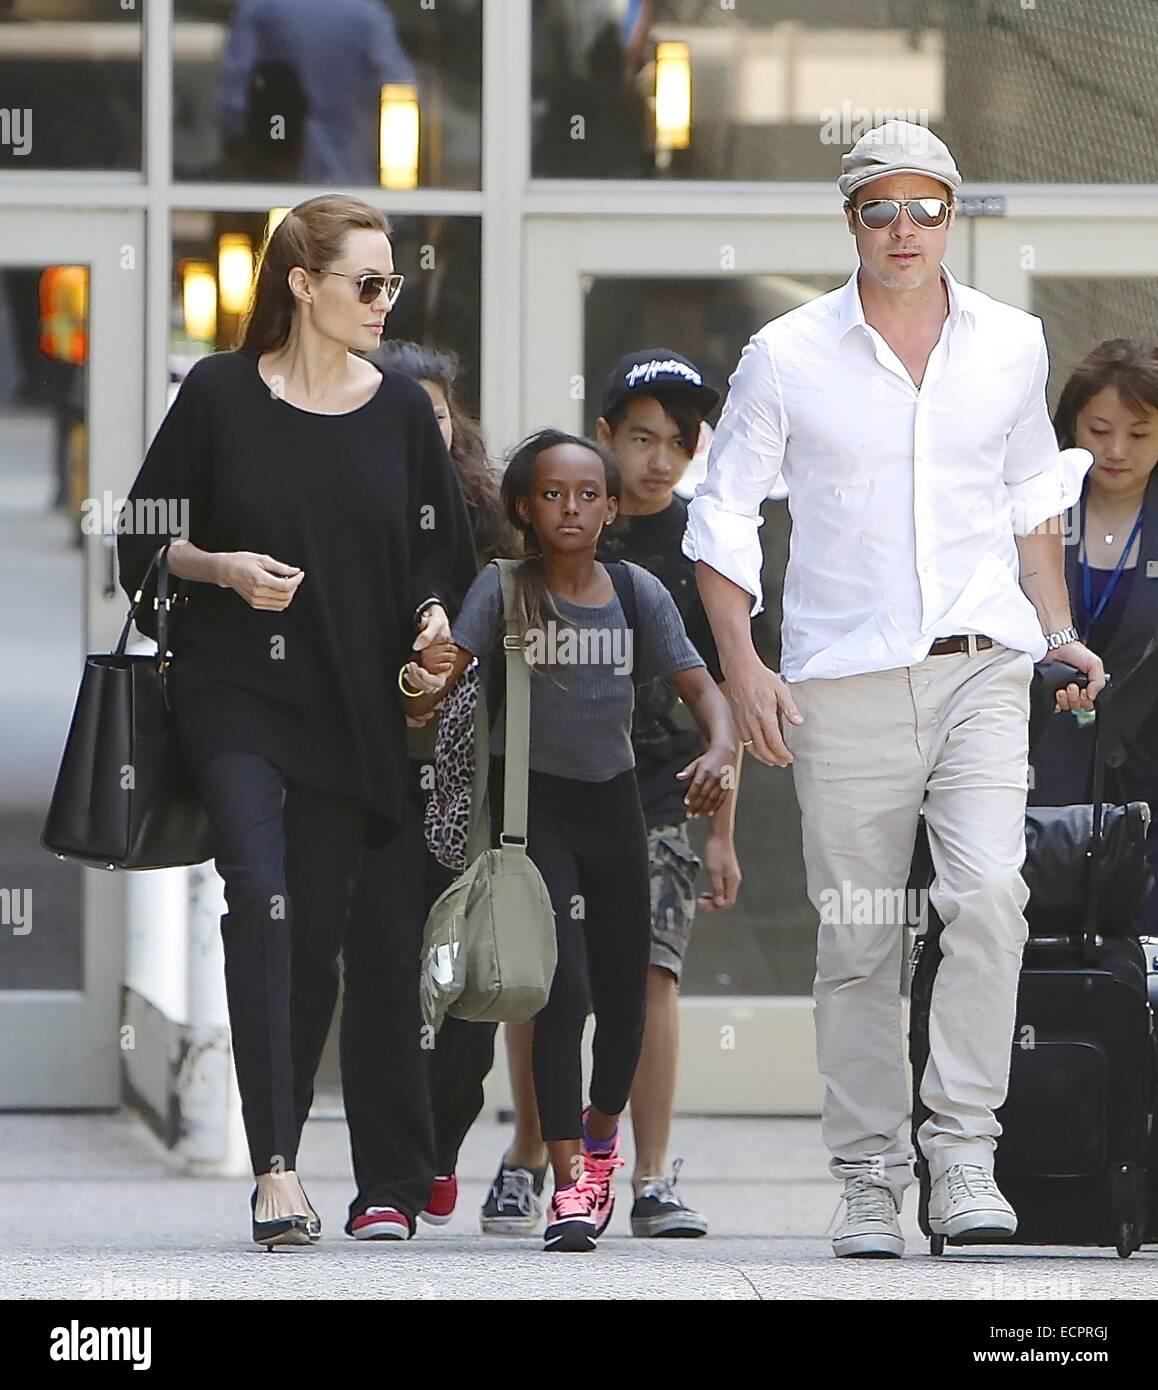 Brad Pitt e Angelina Jolie arriva a Los Angeles International (LAX) aeroporto con i loro figli Maddox e Zahara dotate: Foto Stock